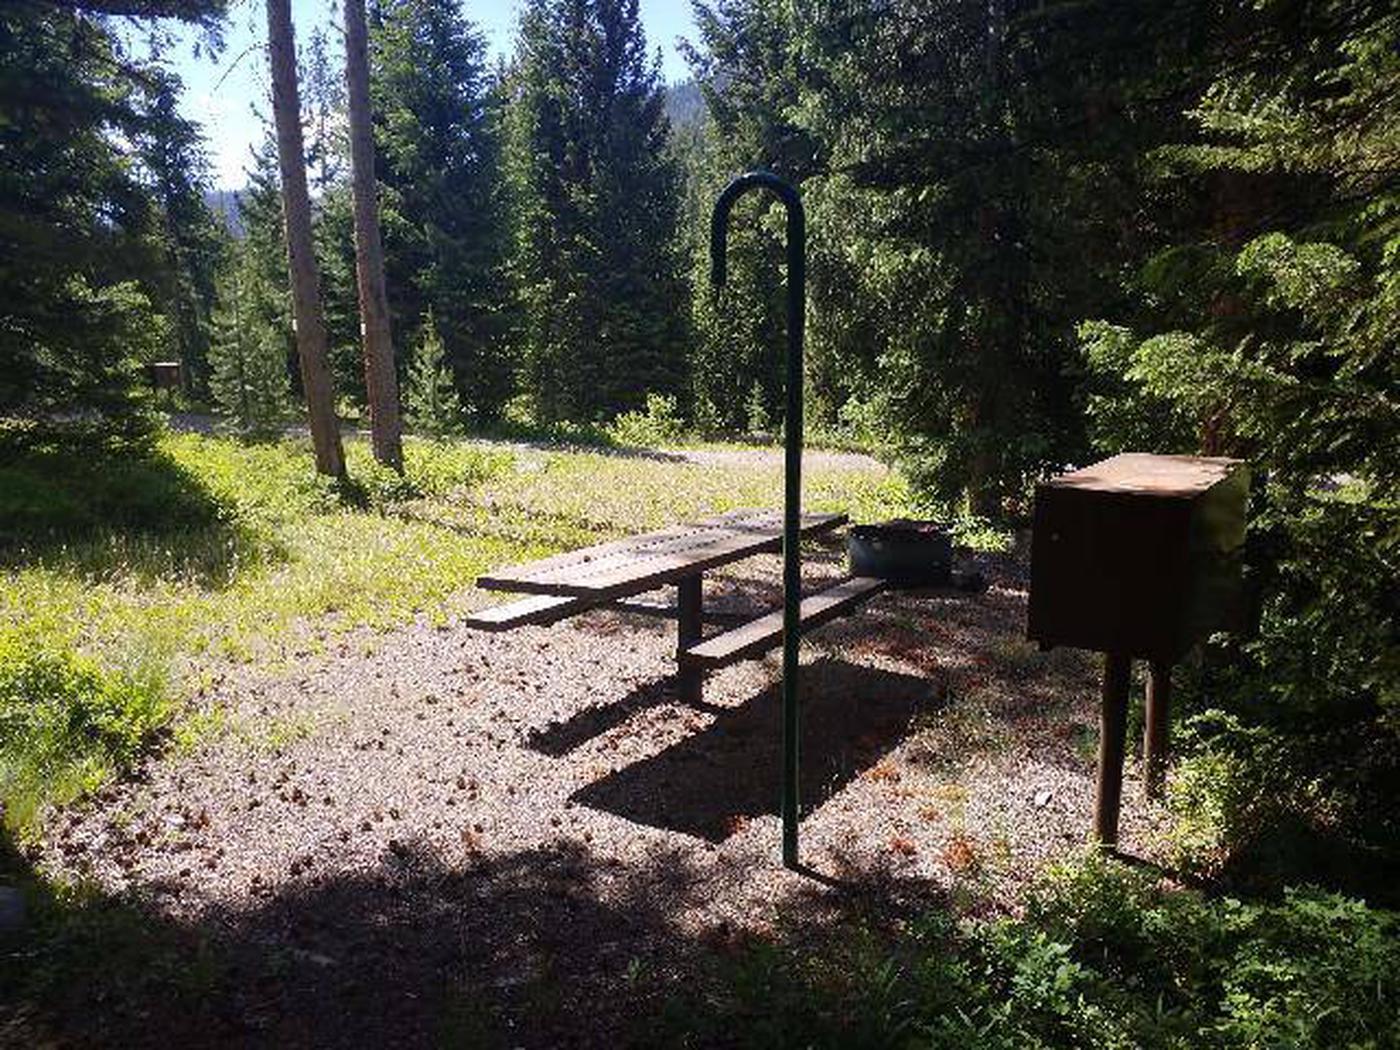 Threemile Campground Campsite 6 - Back View